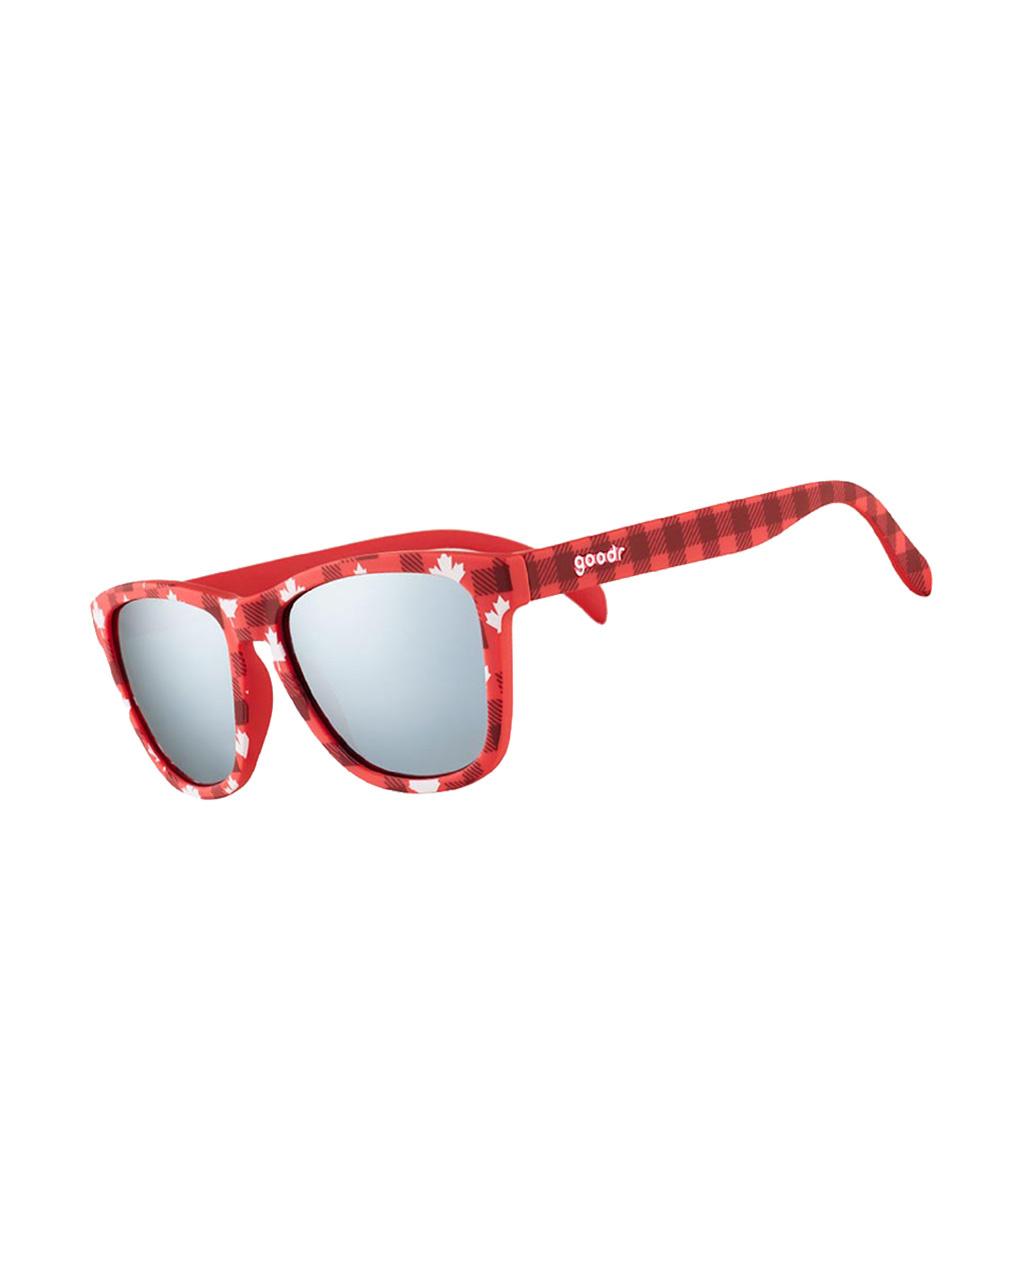 GOODR Goodr Sunglasses The Eh Team (Canada)